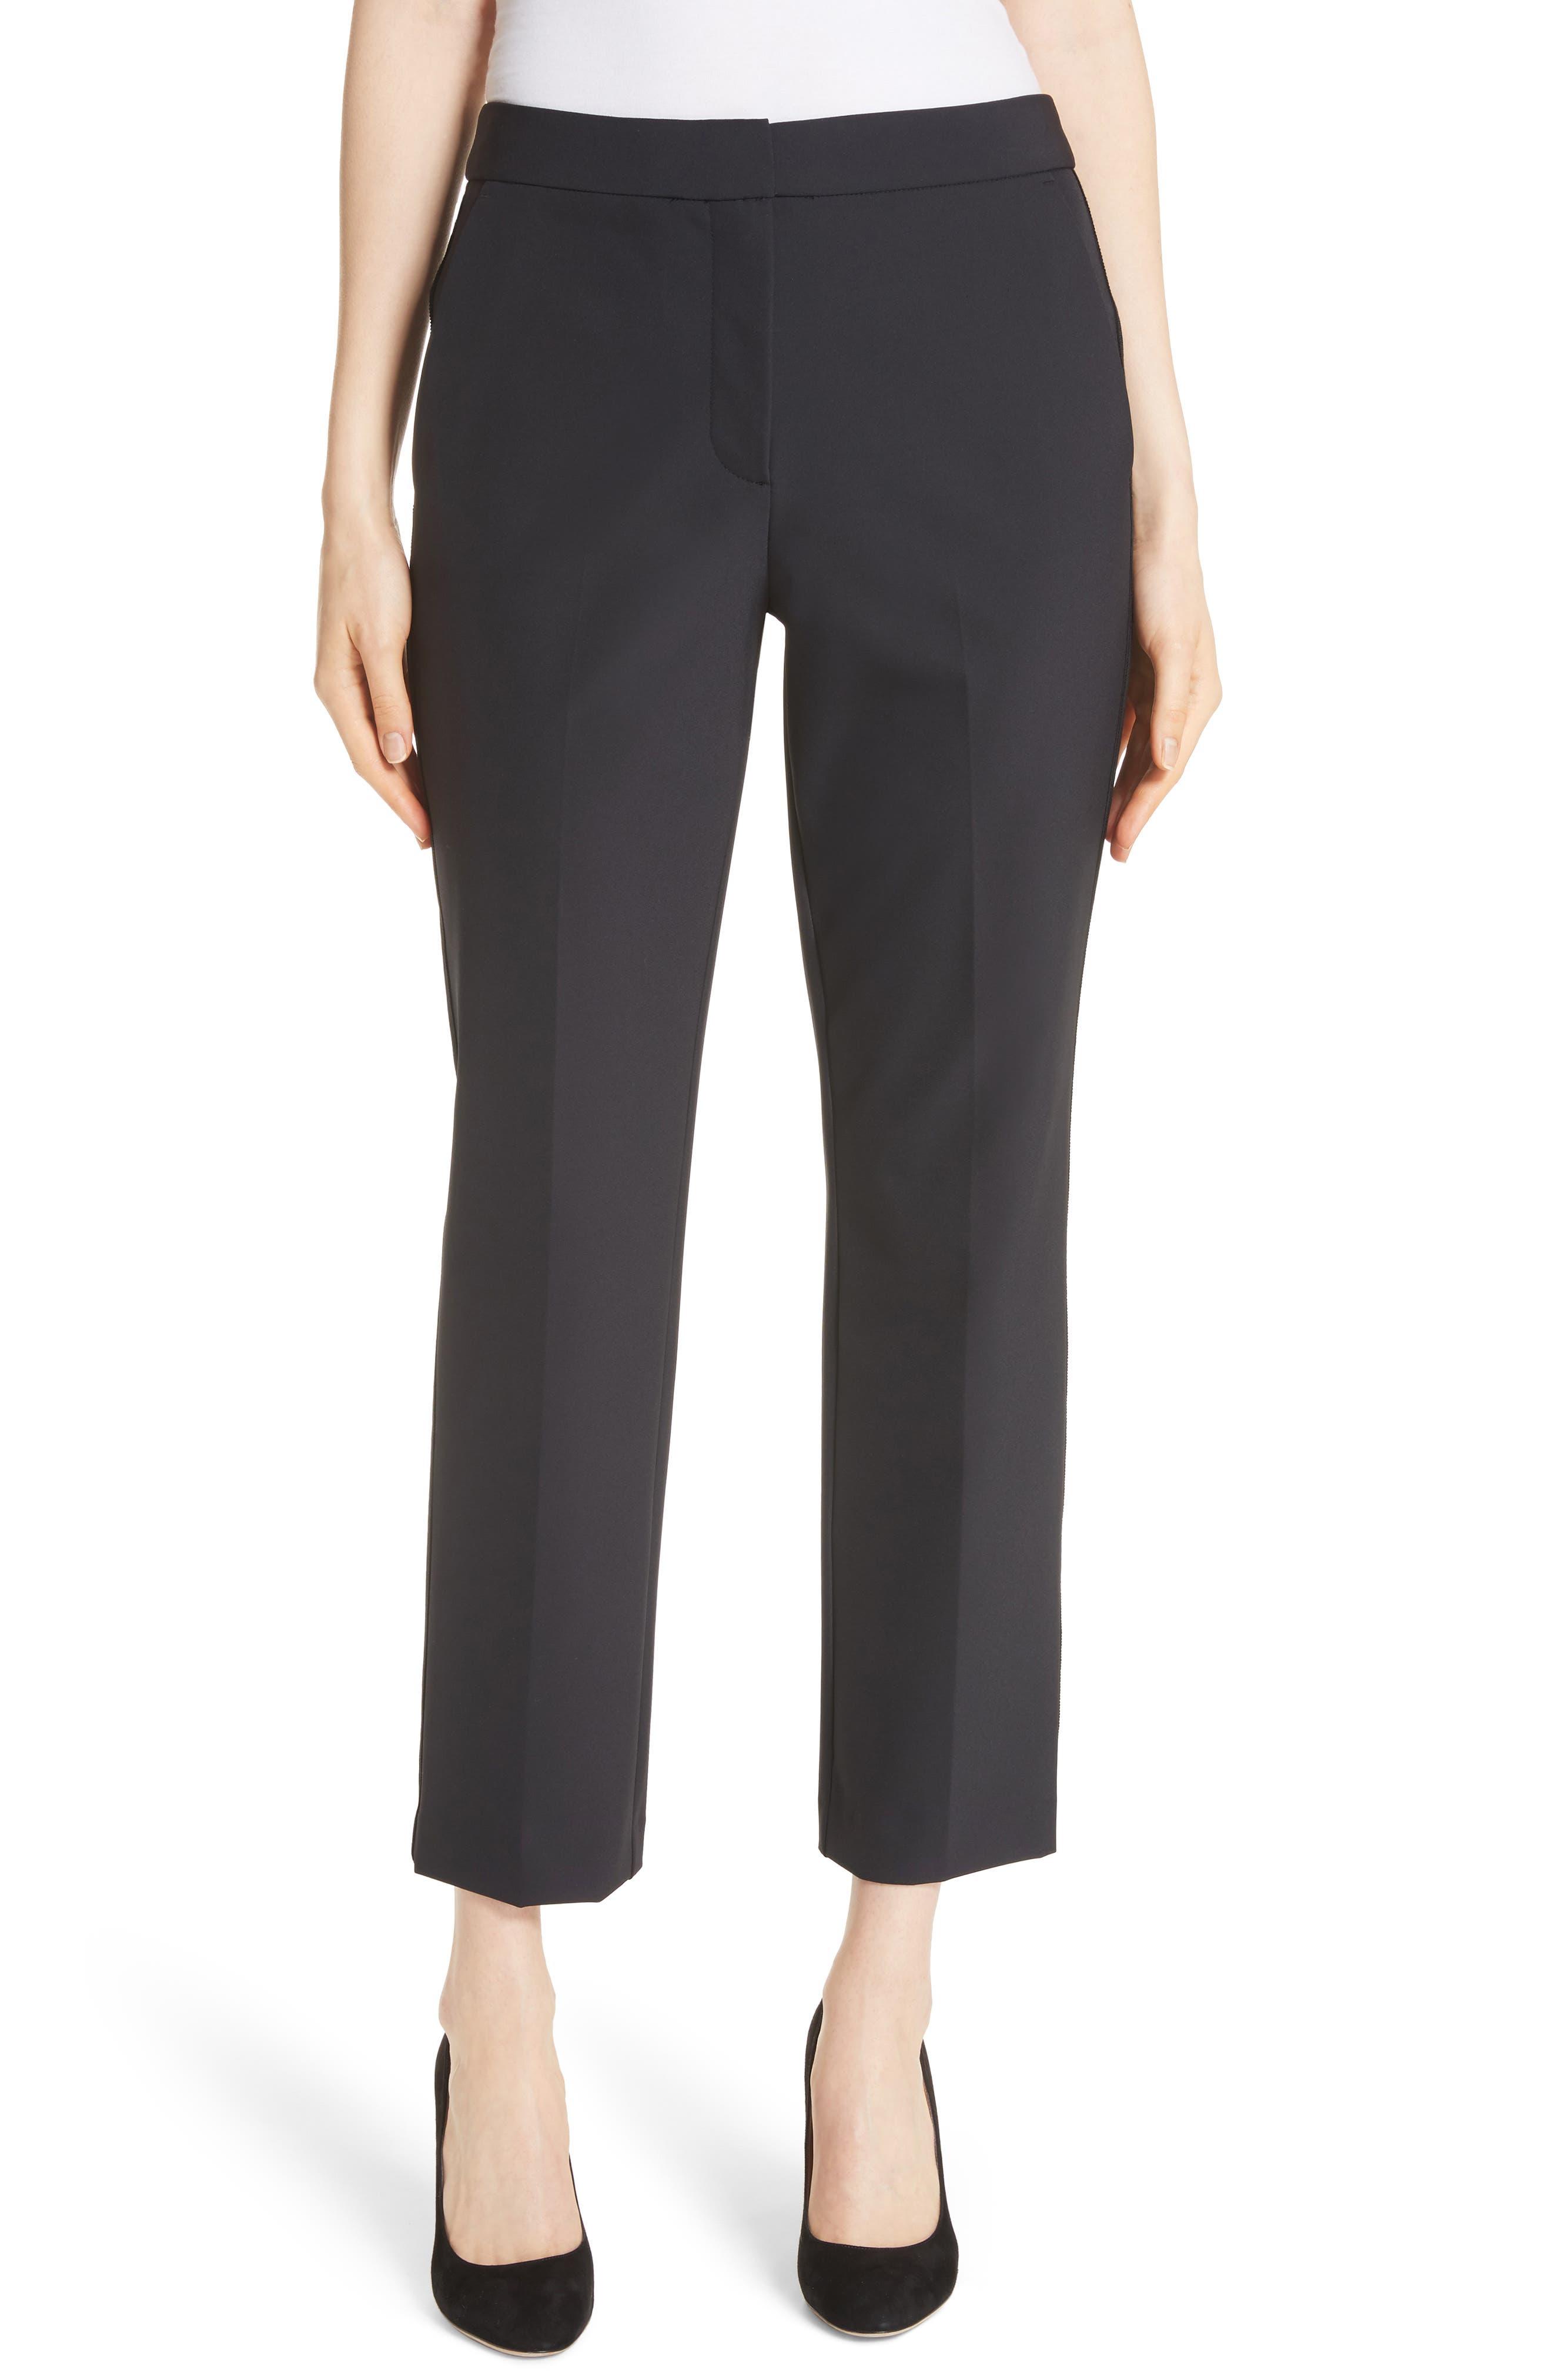 Audra Crop Pants,                             Main thumbnail 1, color,                             BLACK